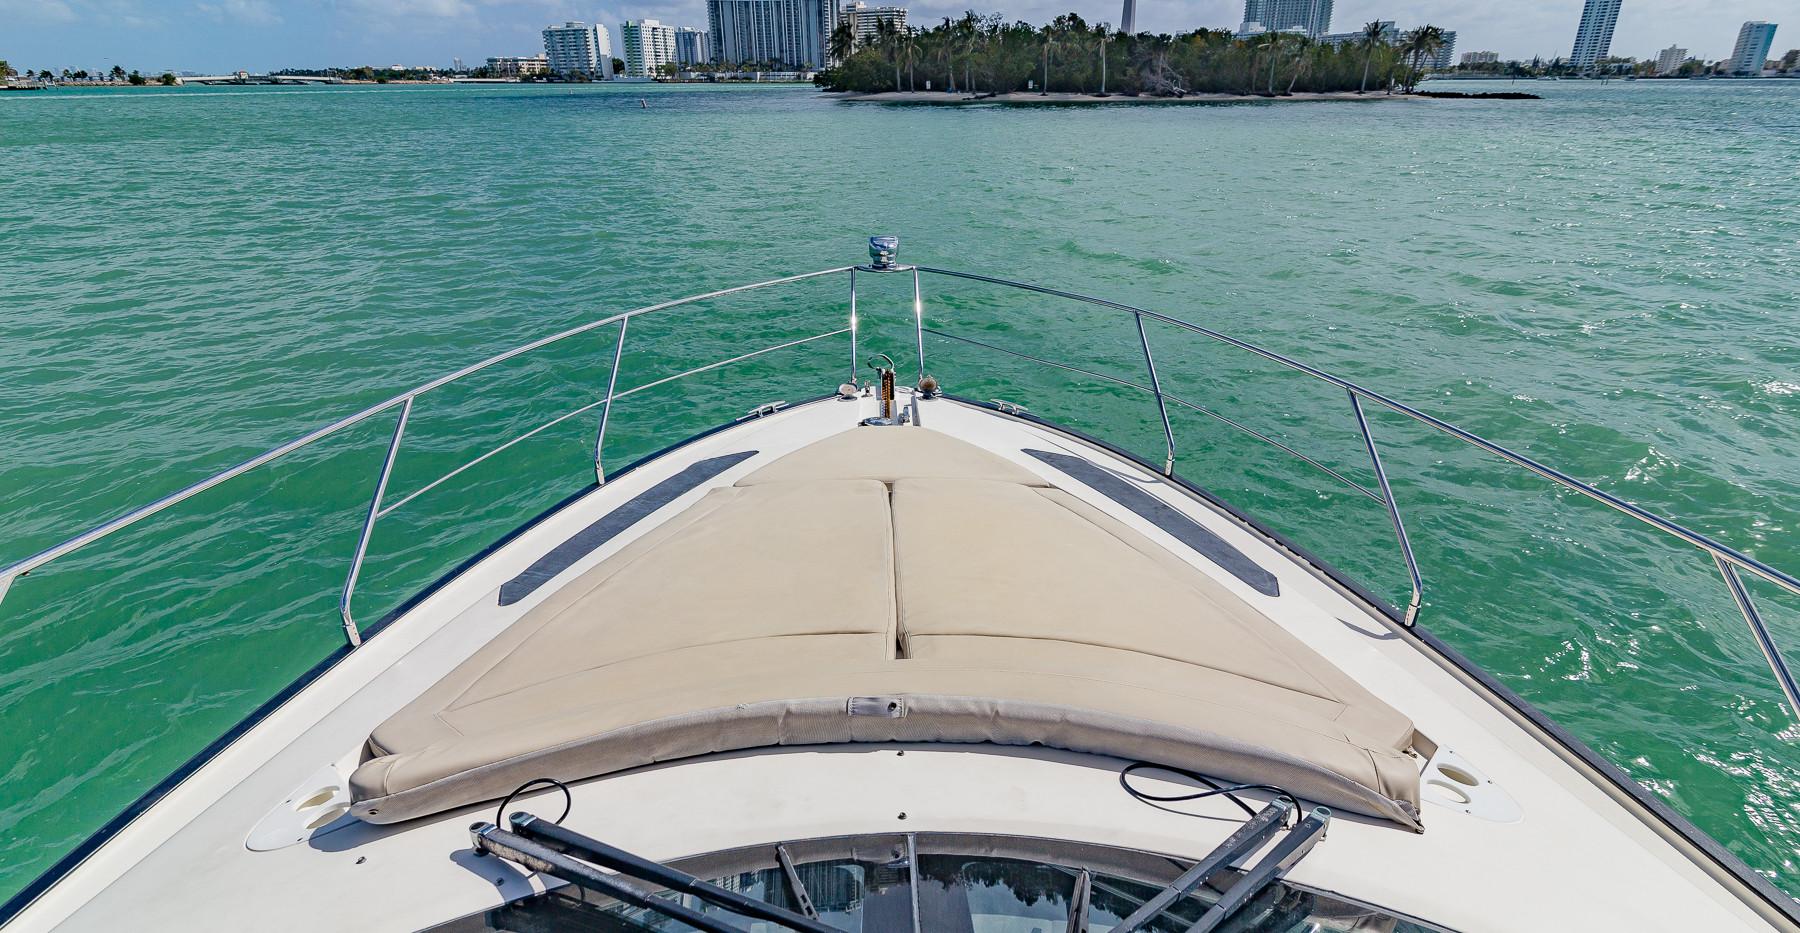 43-marquis-yachting-image-25.jpg